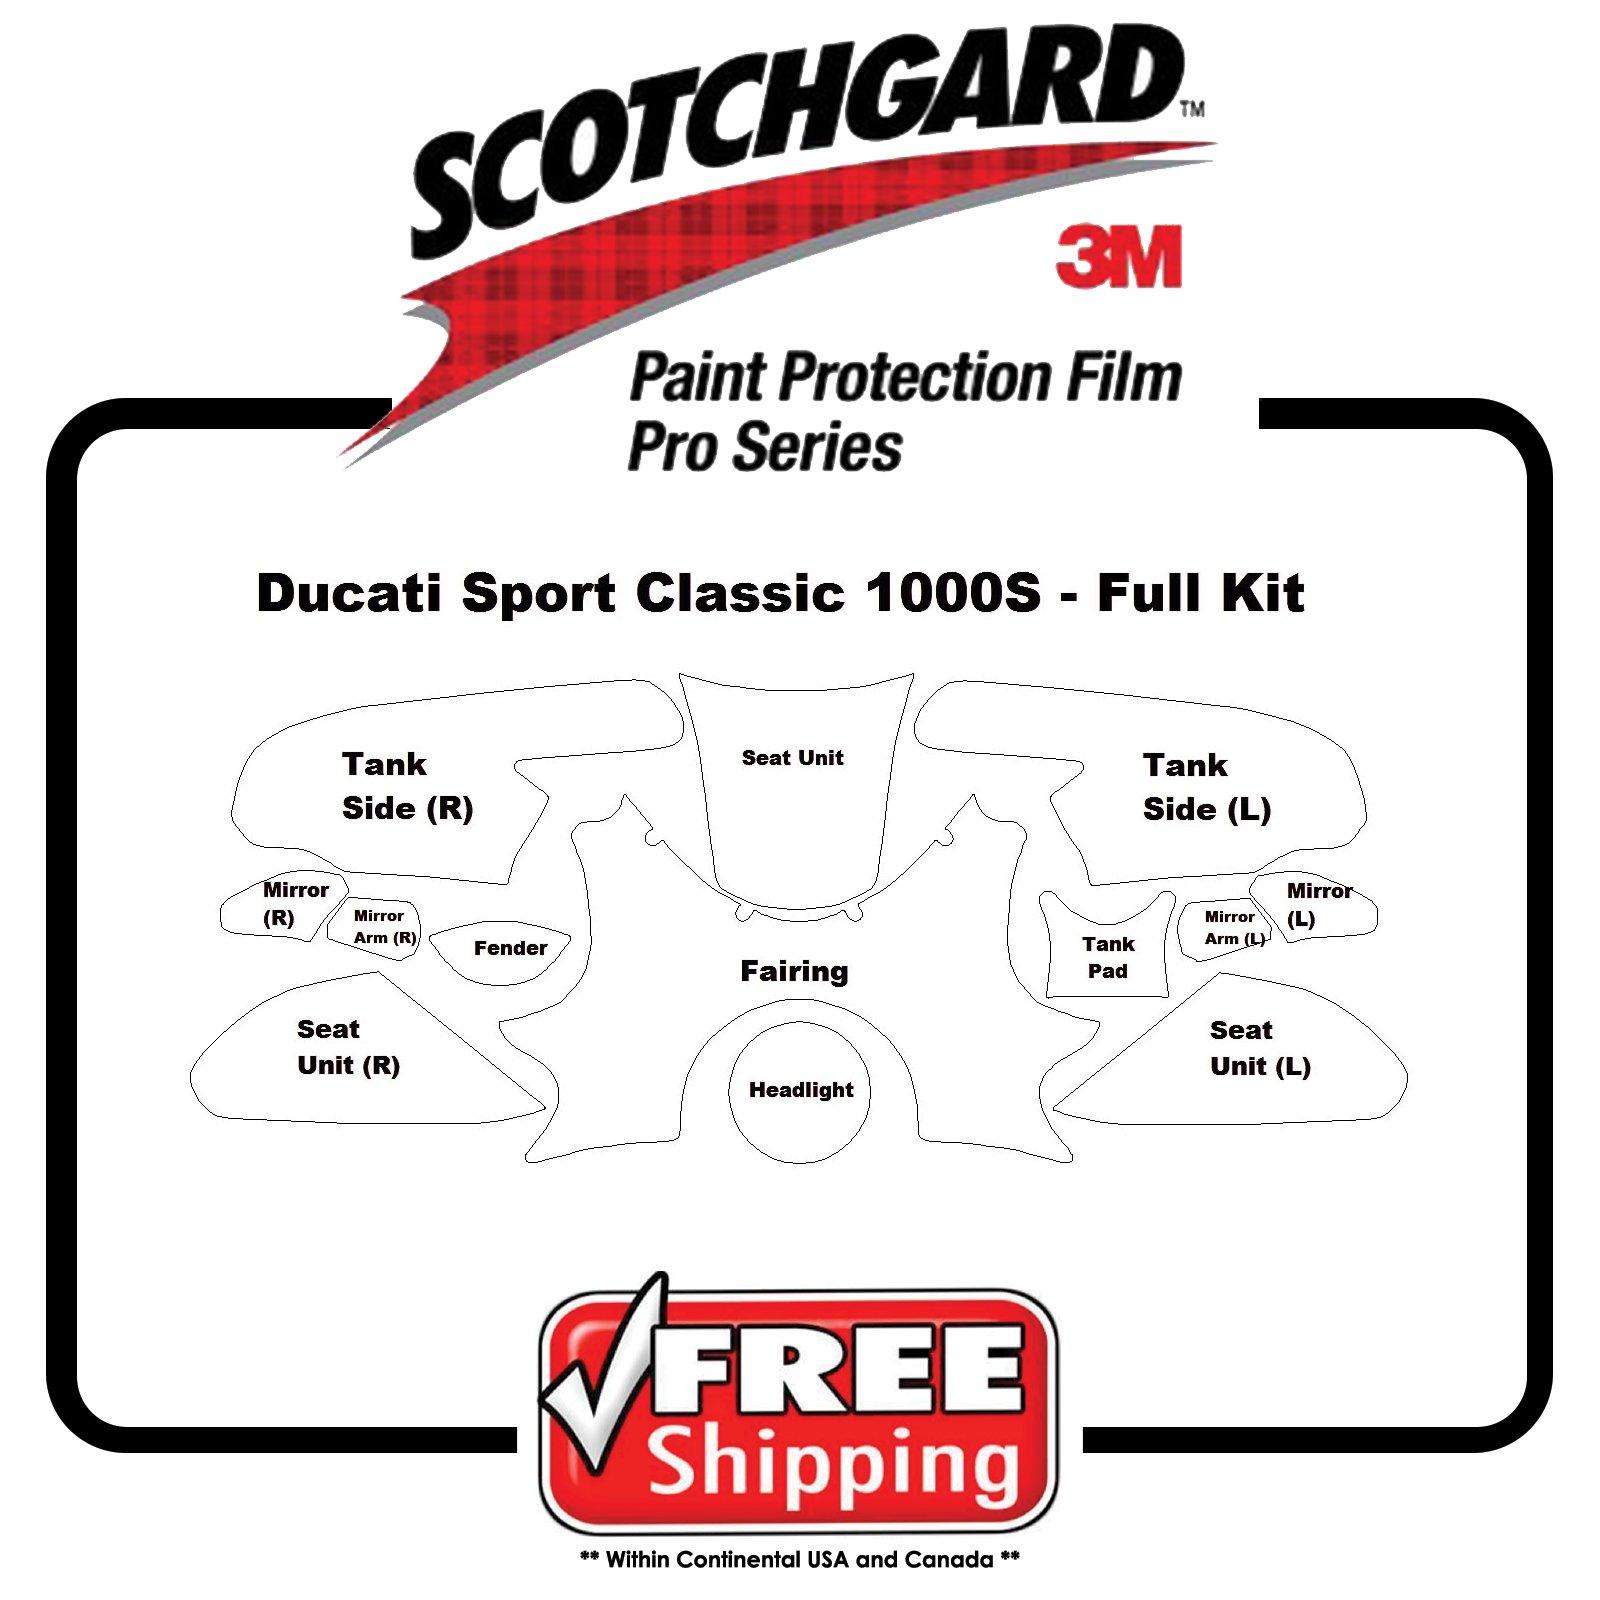 Kits for Ducati Sport Classic 1000s - 3M 948 PRO SERIES - Paint Protection by PrintsnPlots